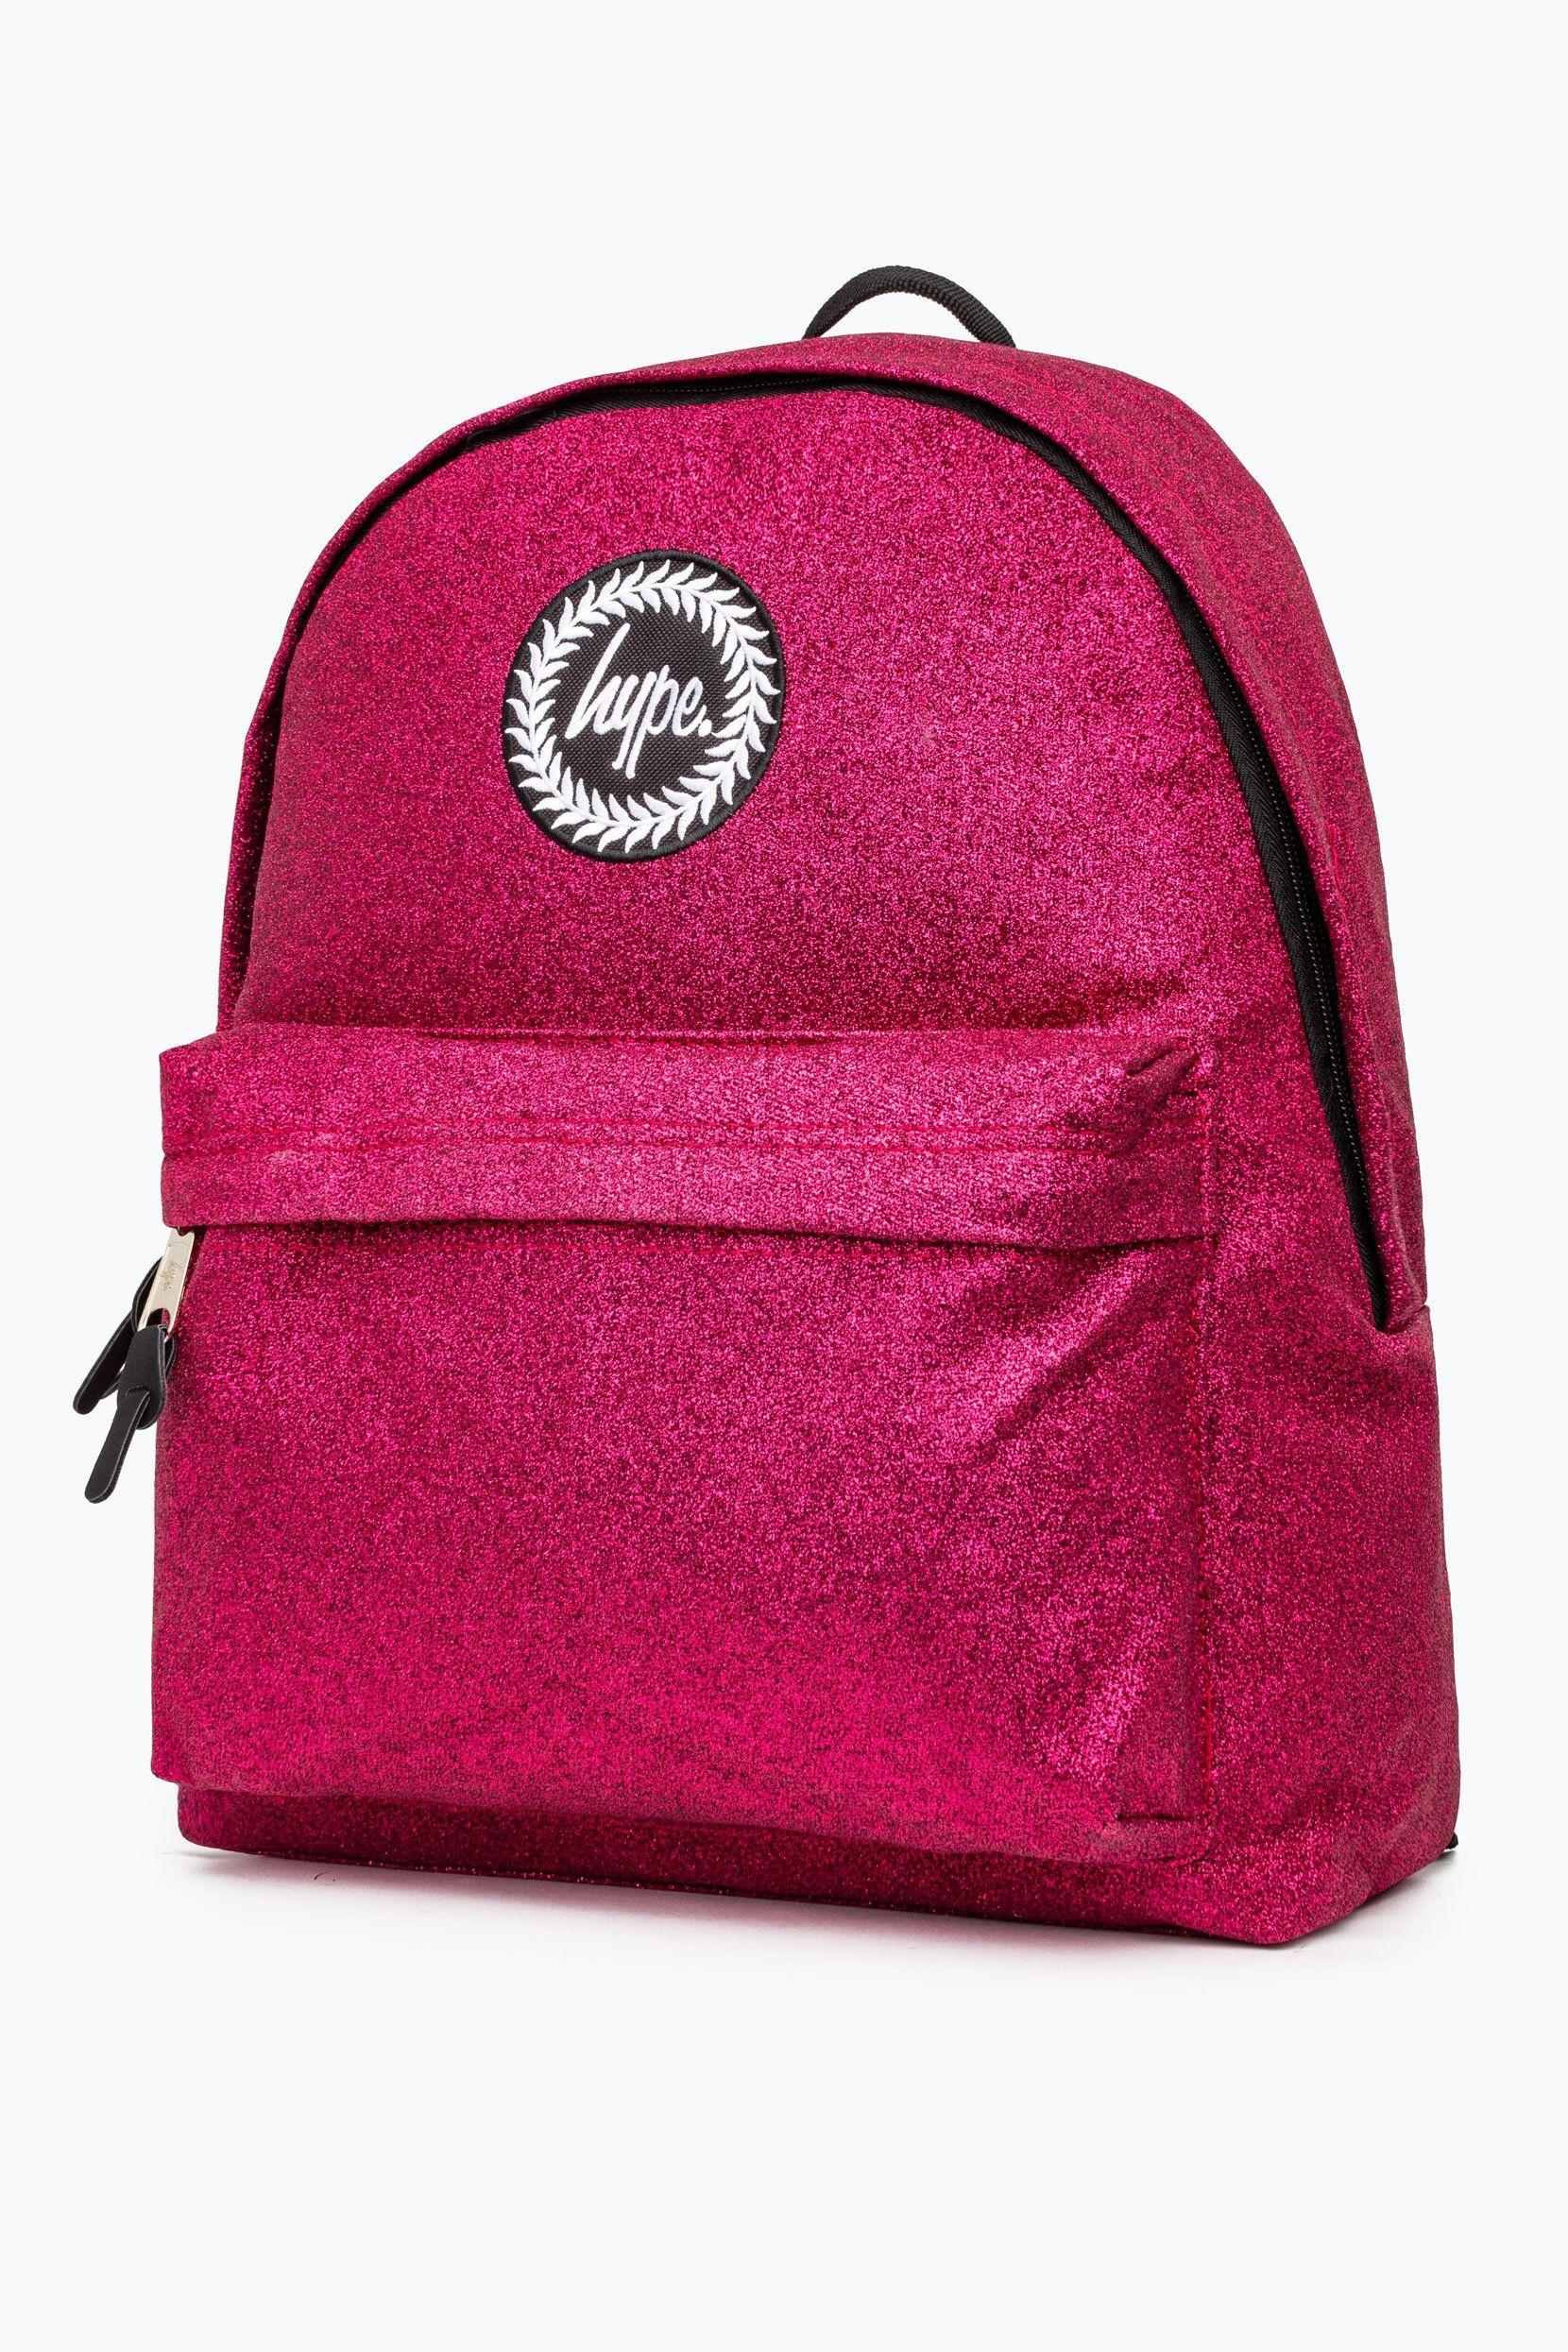 Hype Pink Glitter Backpack